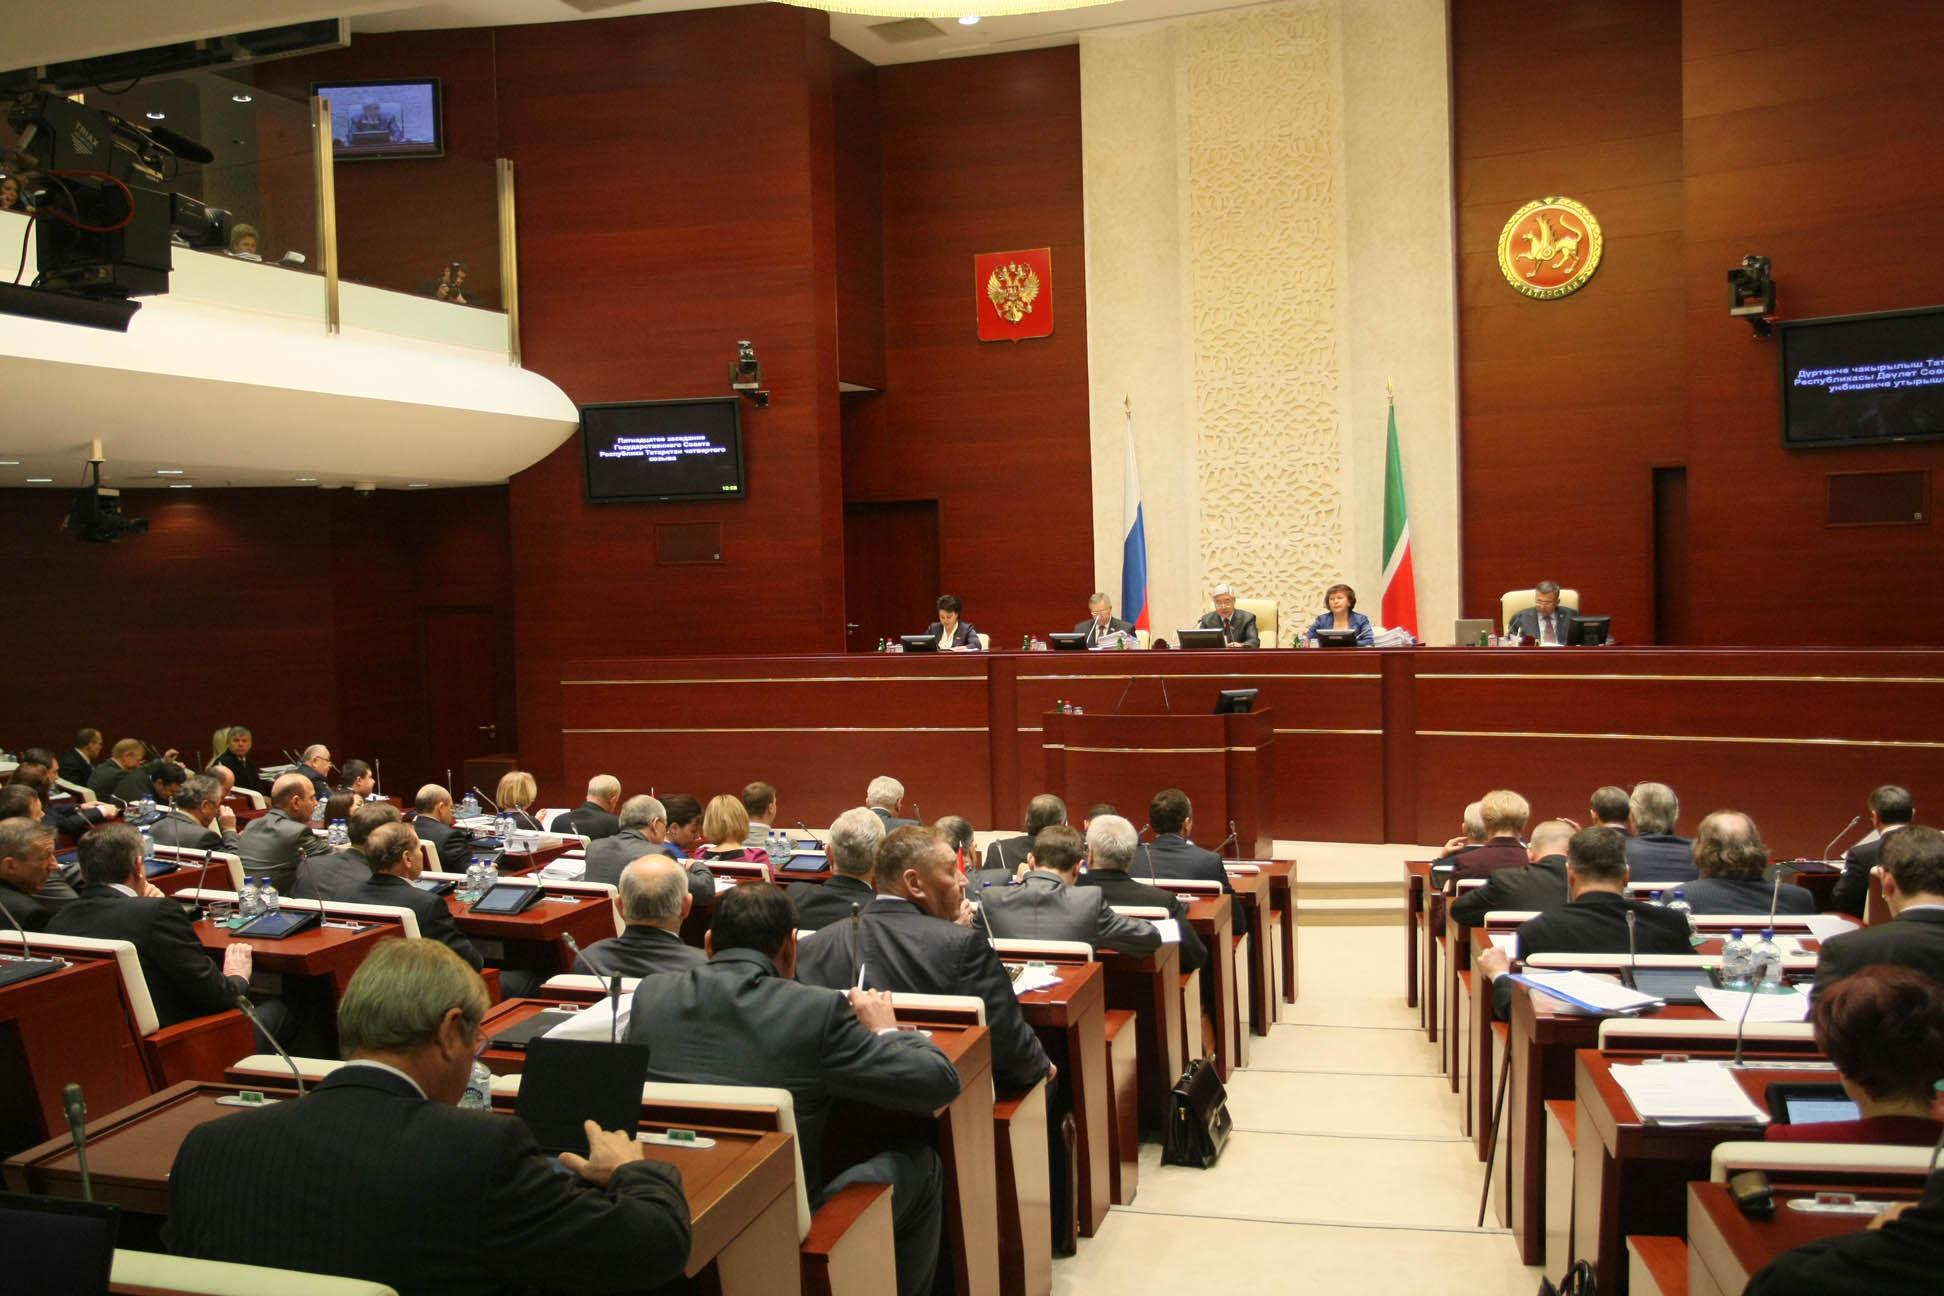 Доходная часть бюджета Татарстана на 2017 год увеличена на 7 млрд рублей